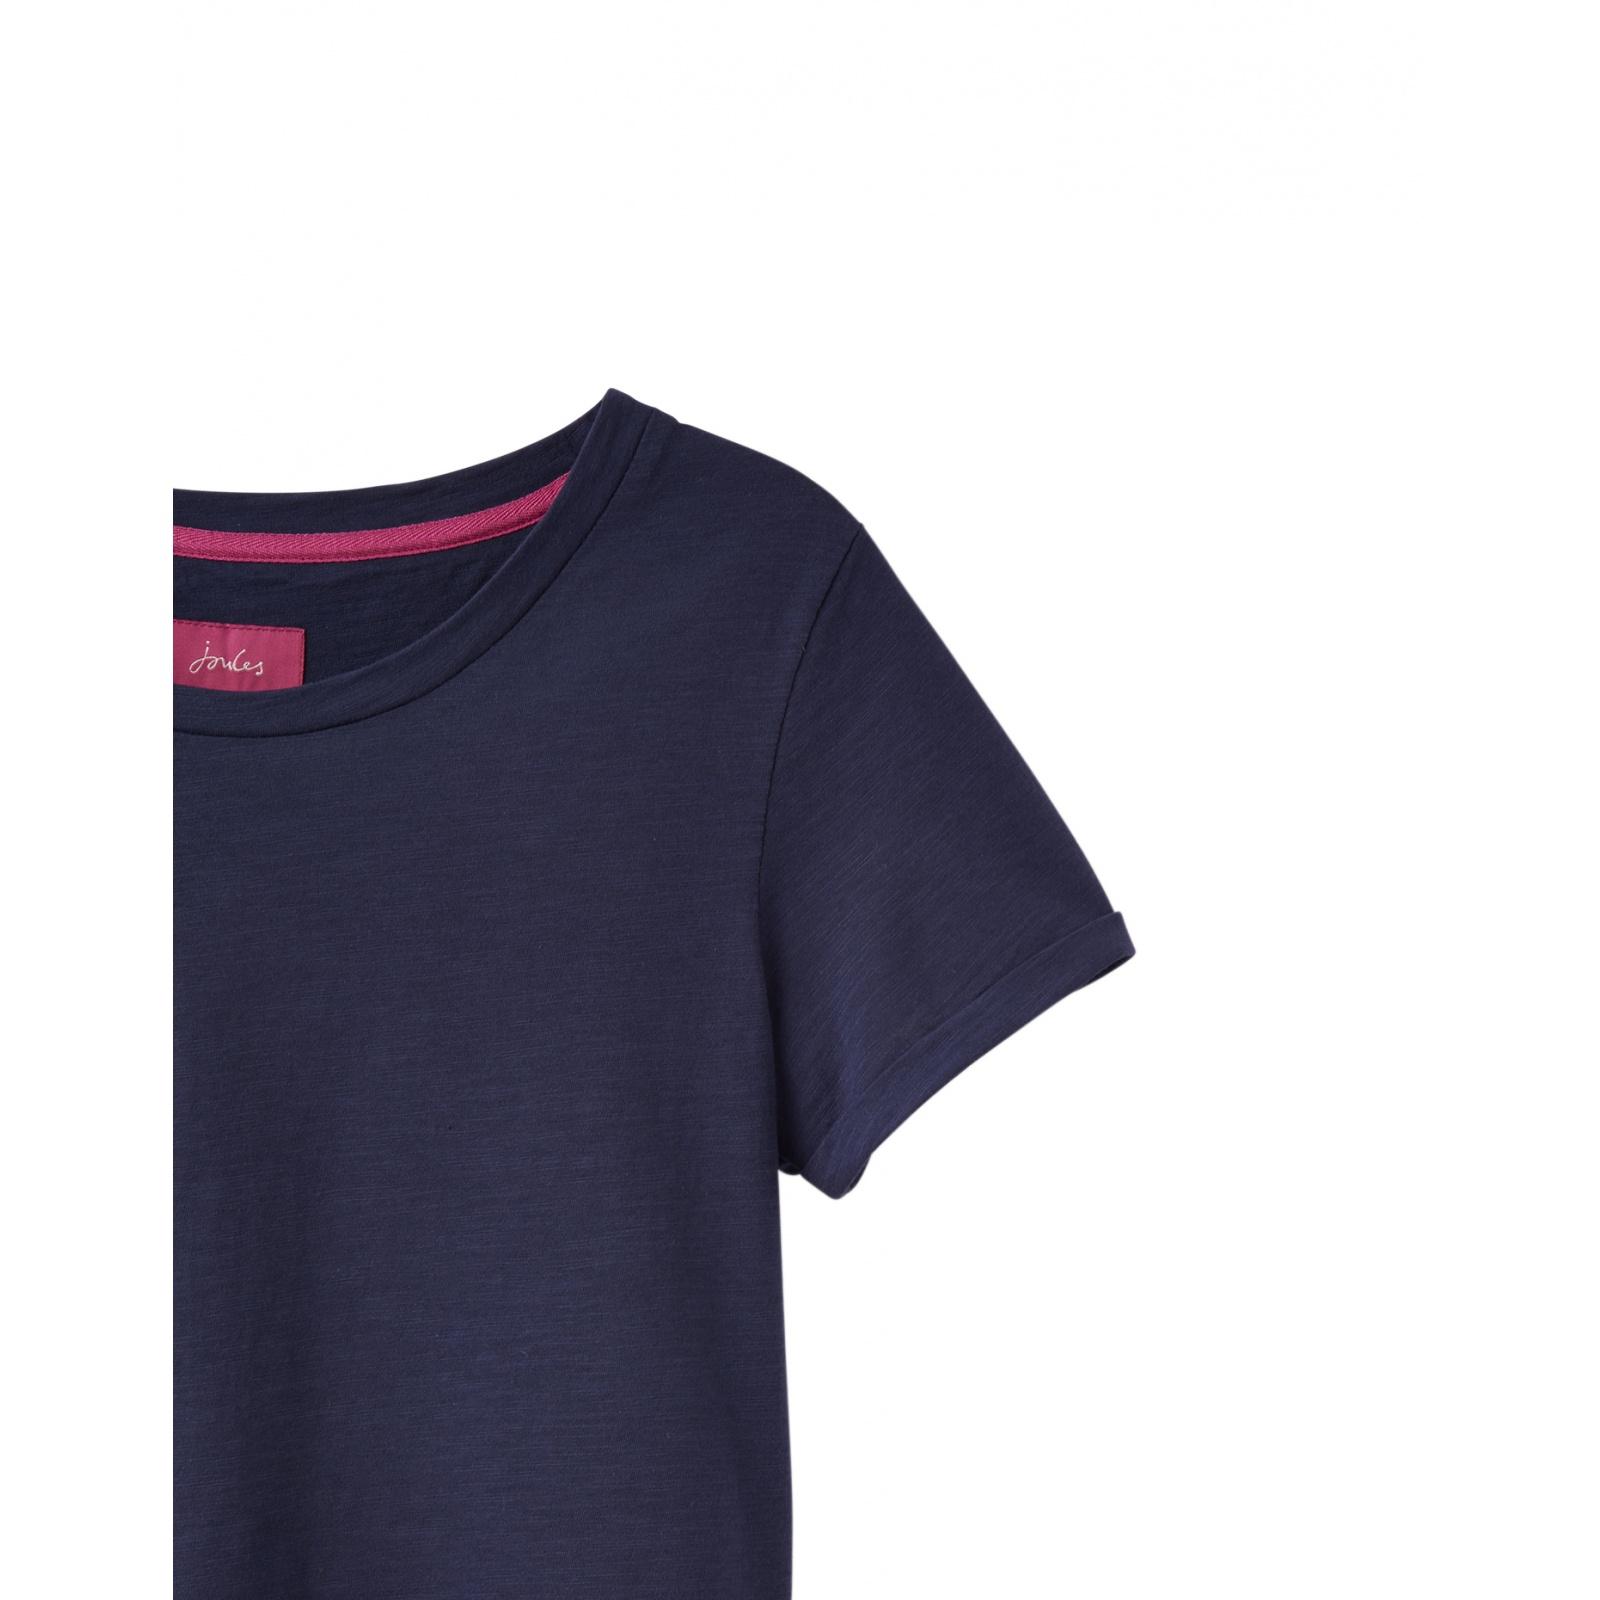 Joules-Nessa-ligero-Jersey-Camiseta-SS19 miniatura 21